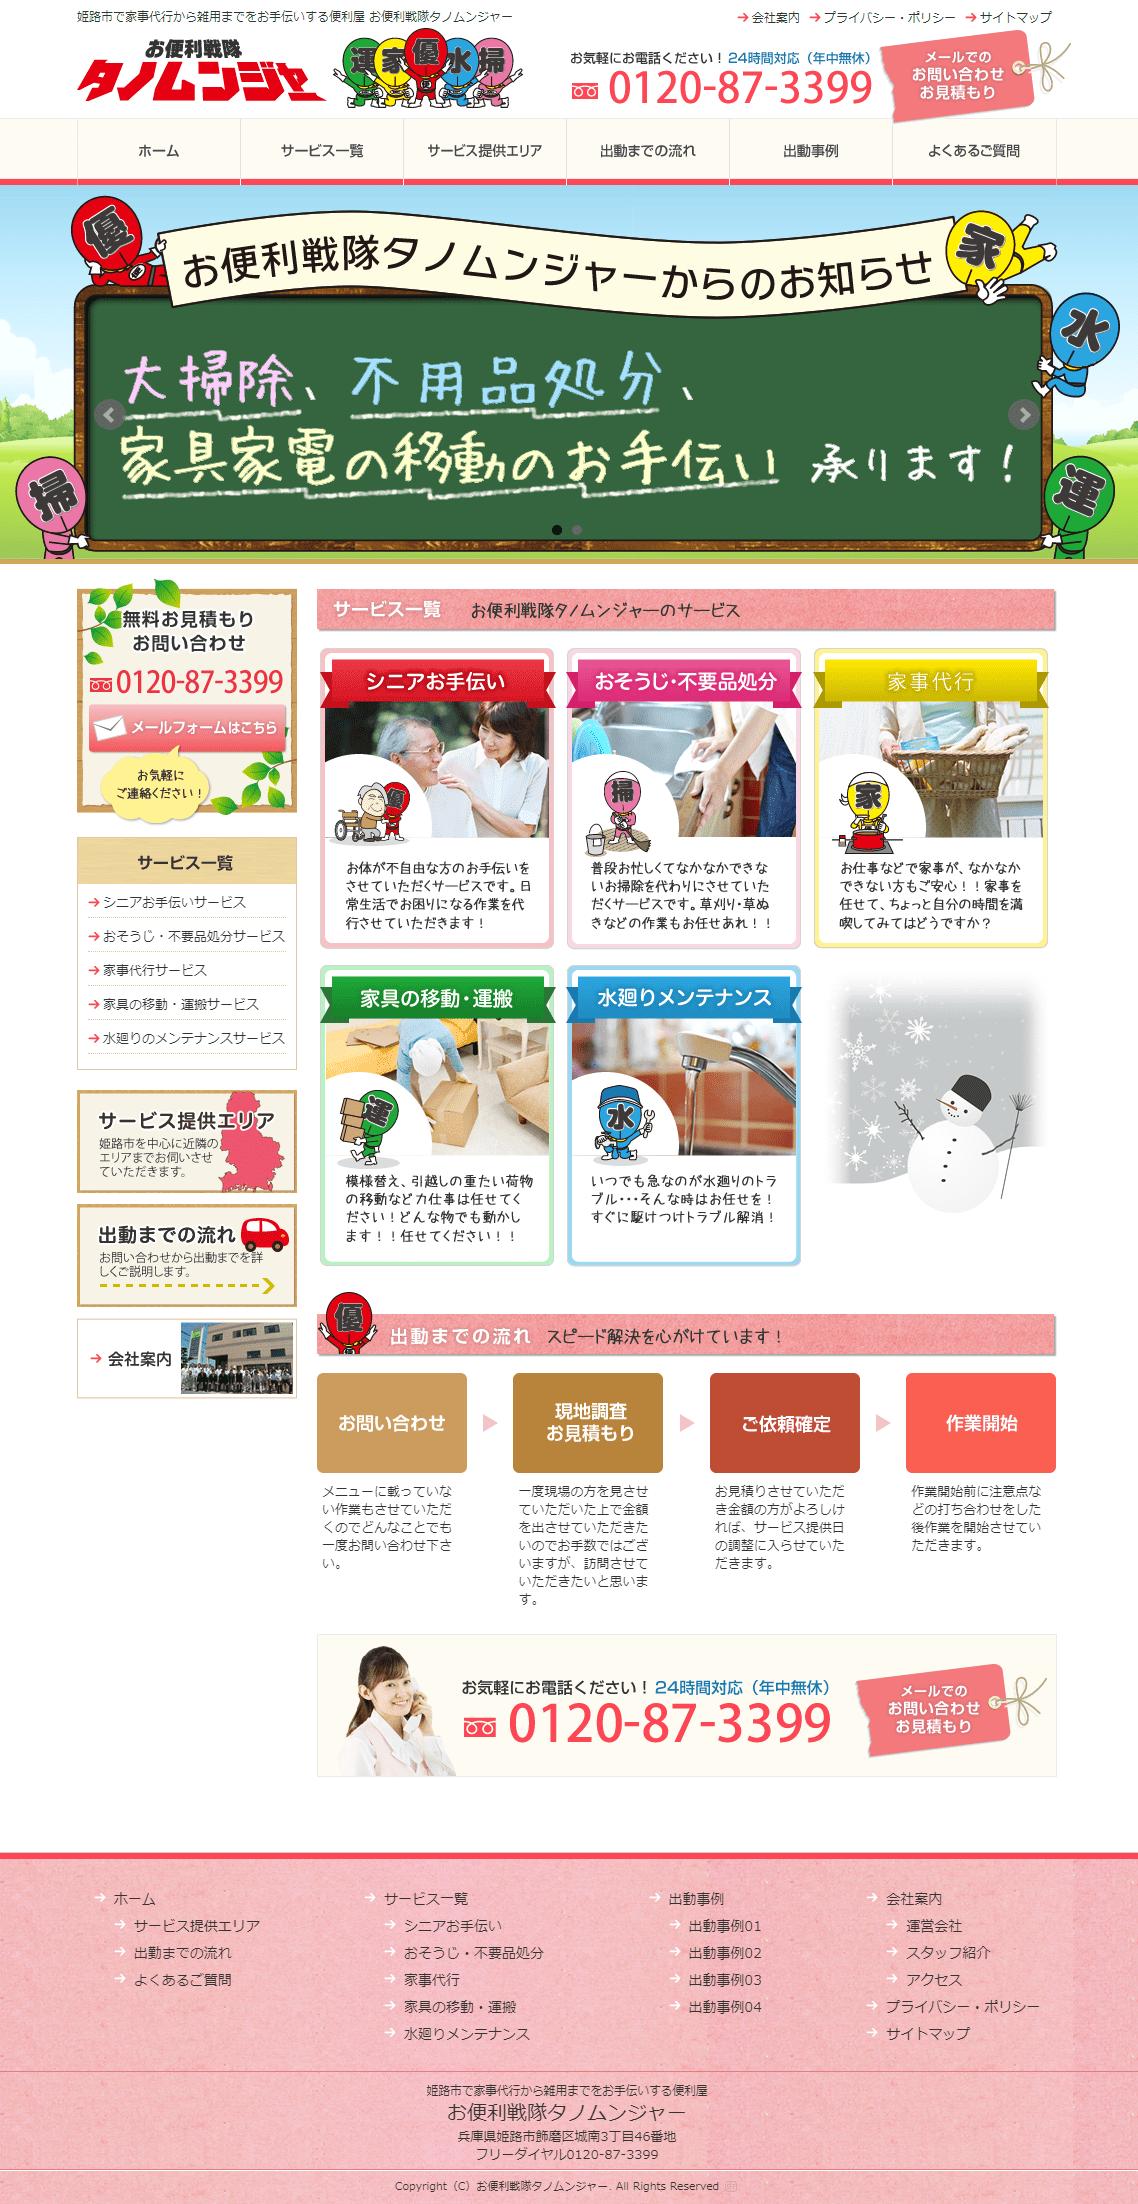 姫路市 坂上住設株式会社様 ホームページ制作1